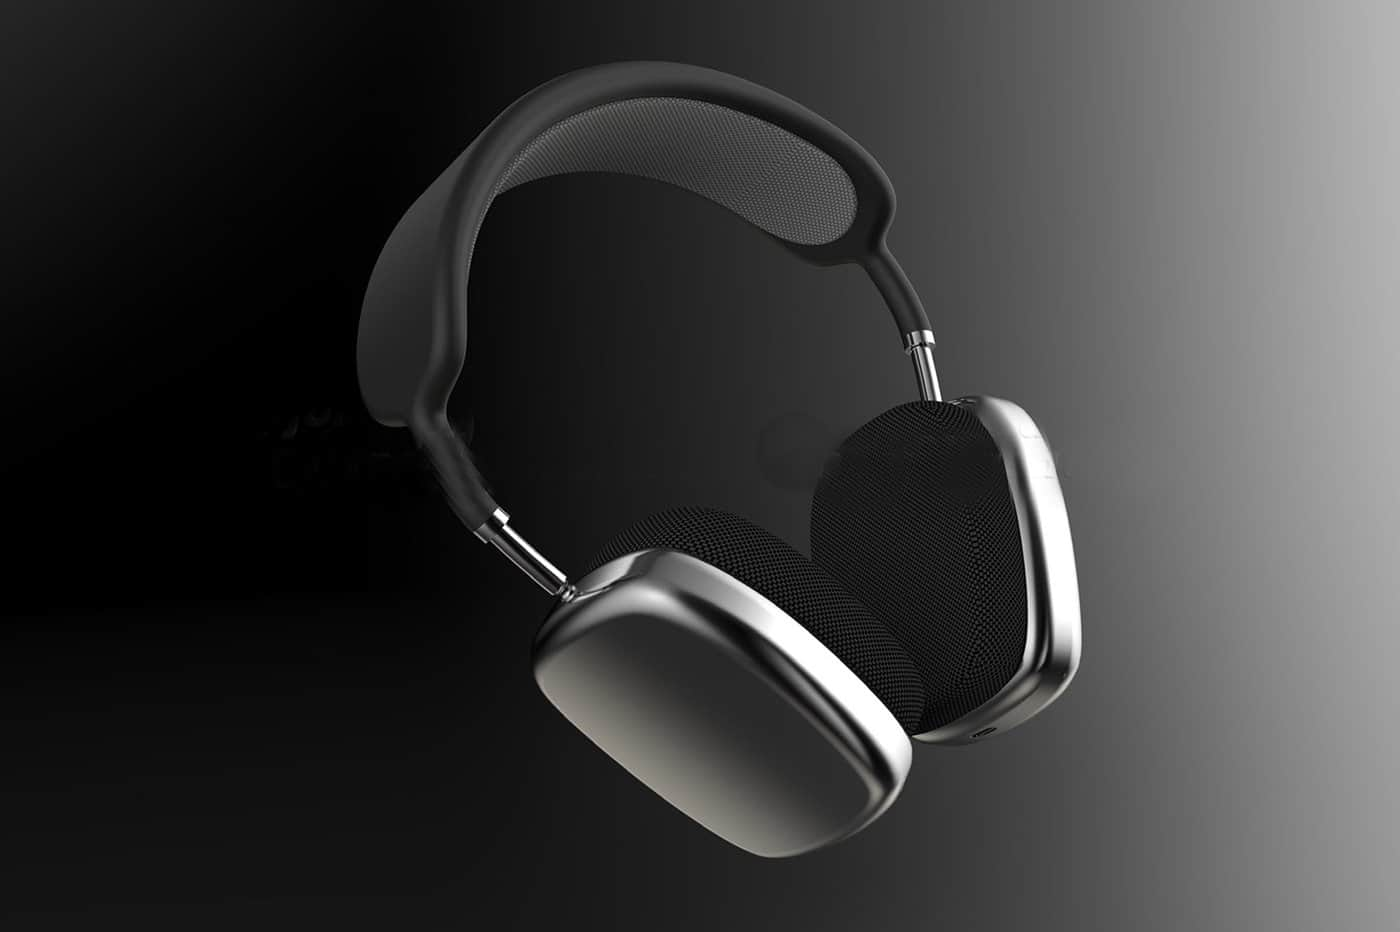 Image 3D du AirPods Studio